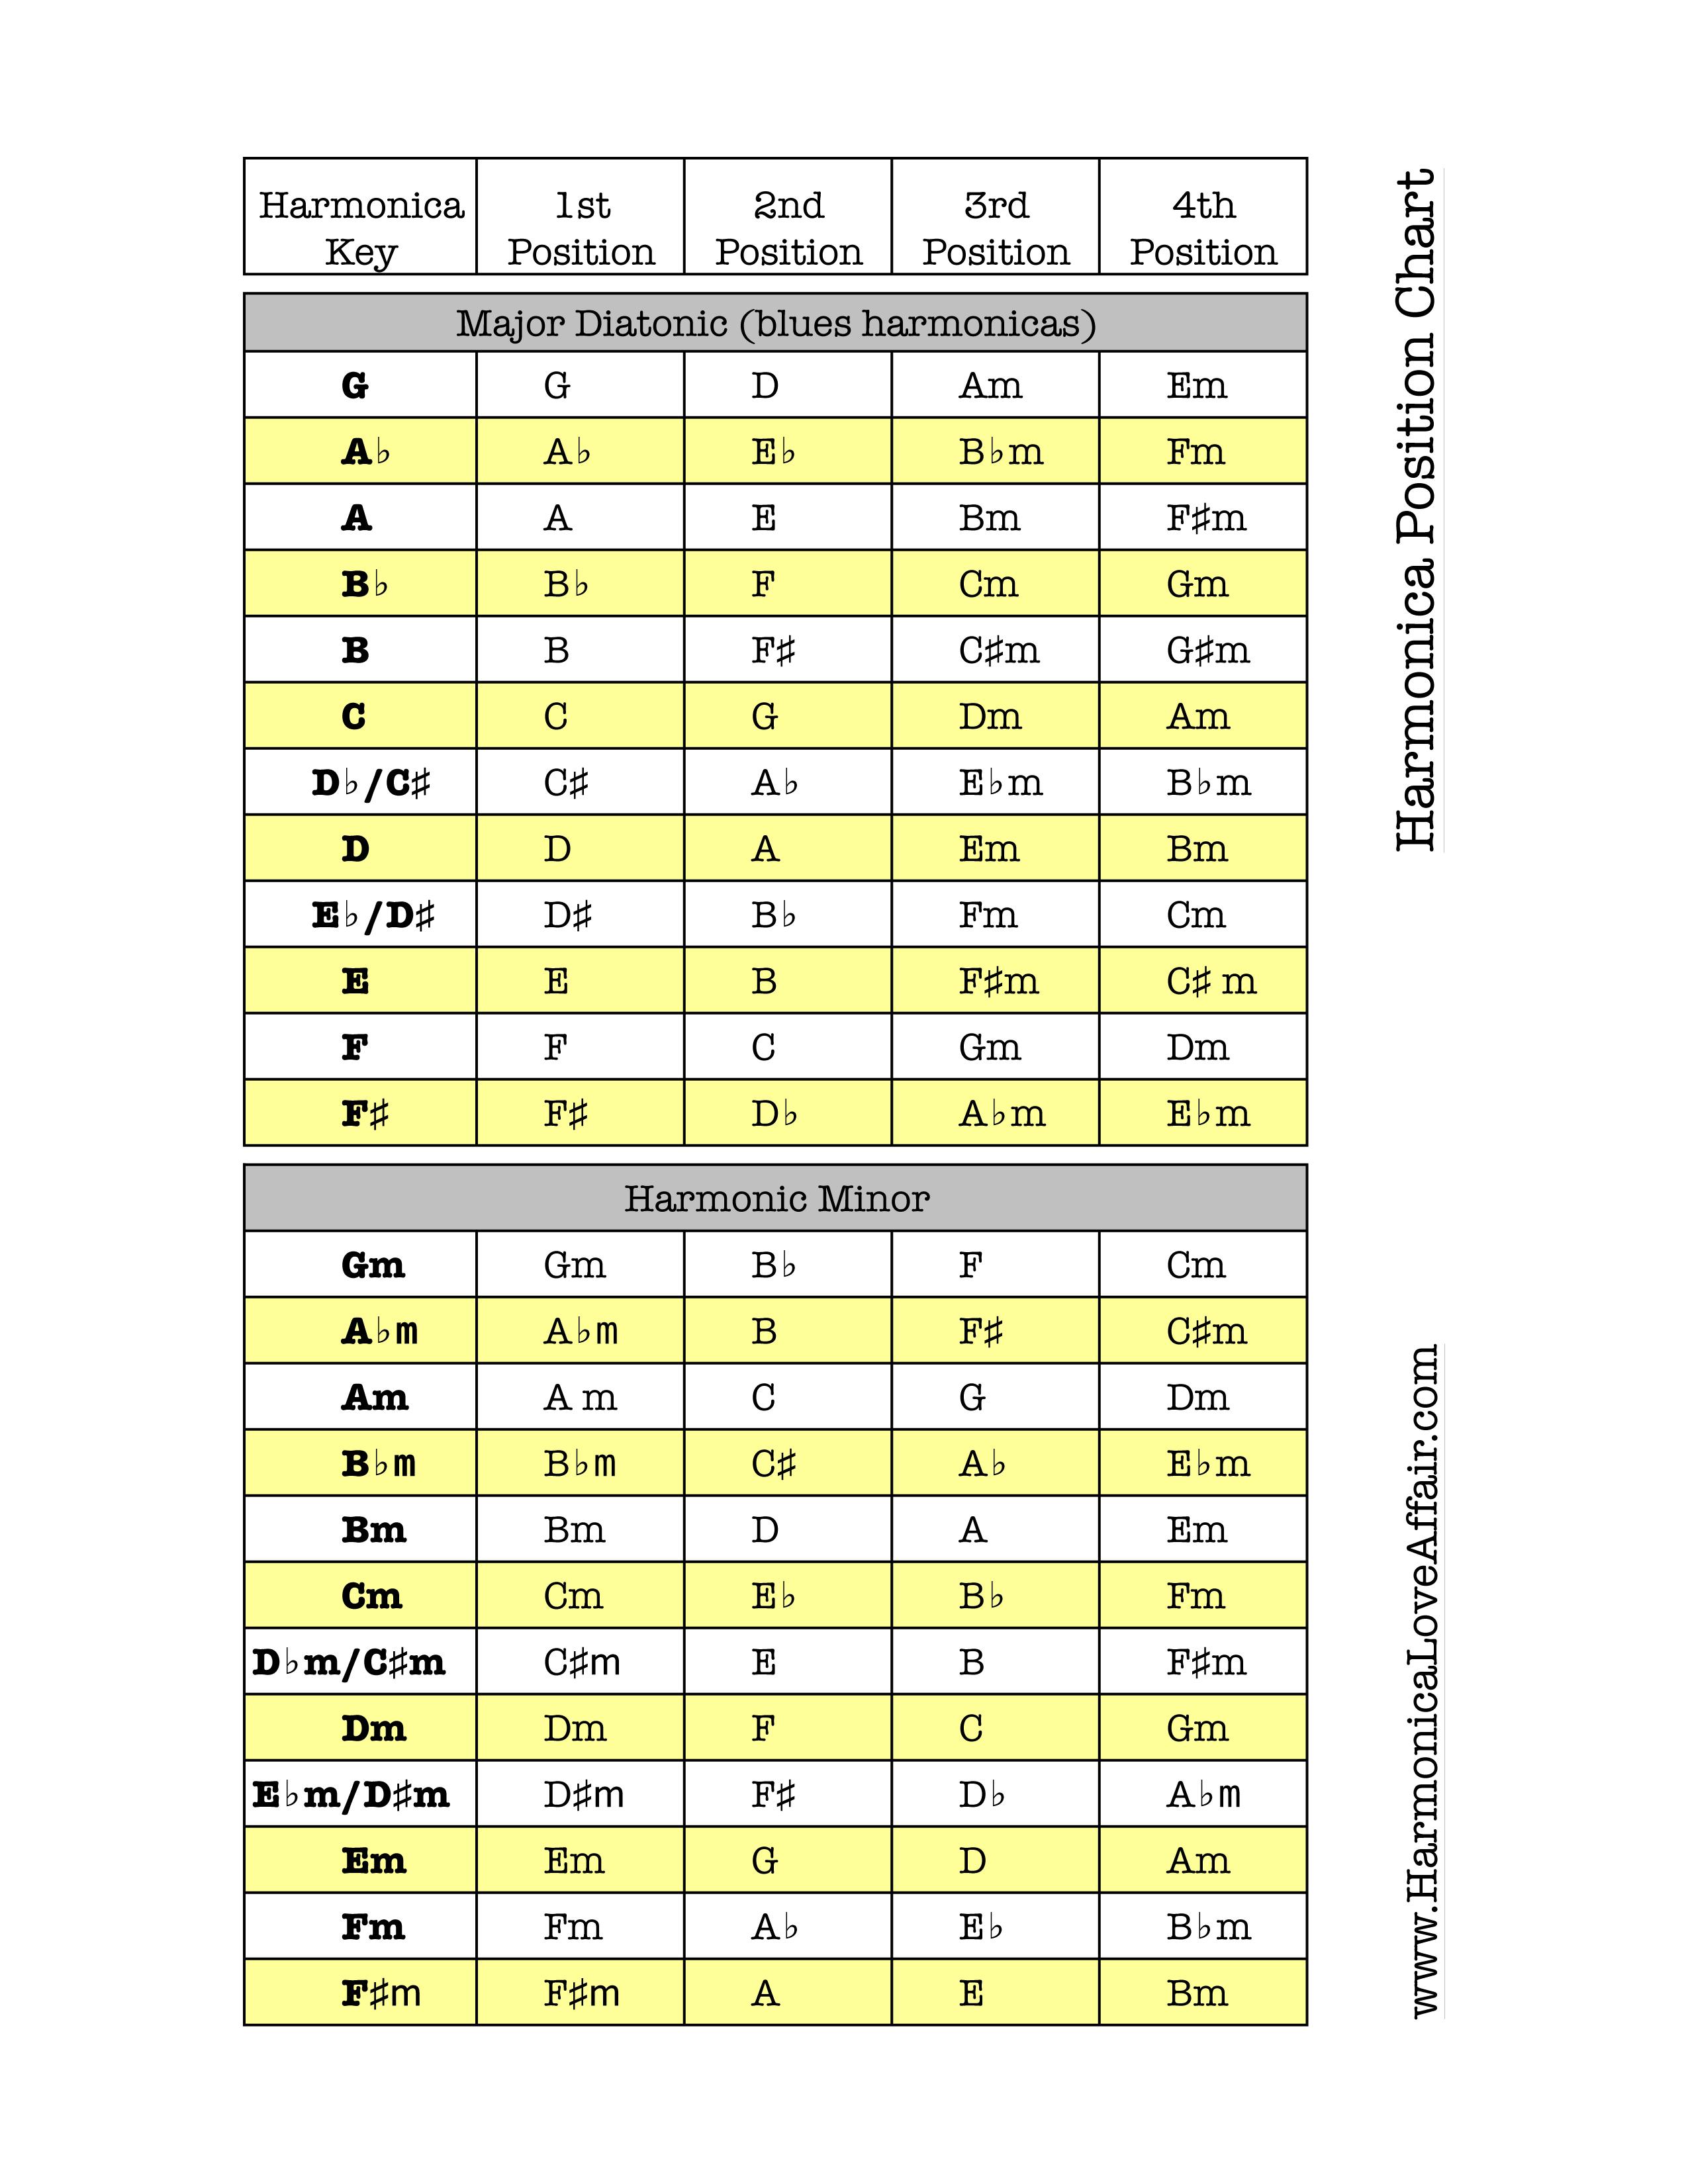 bm chart